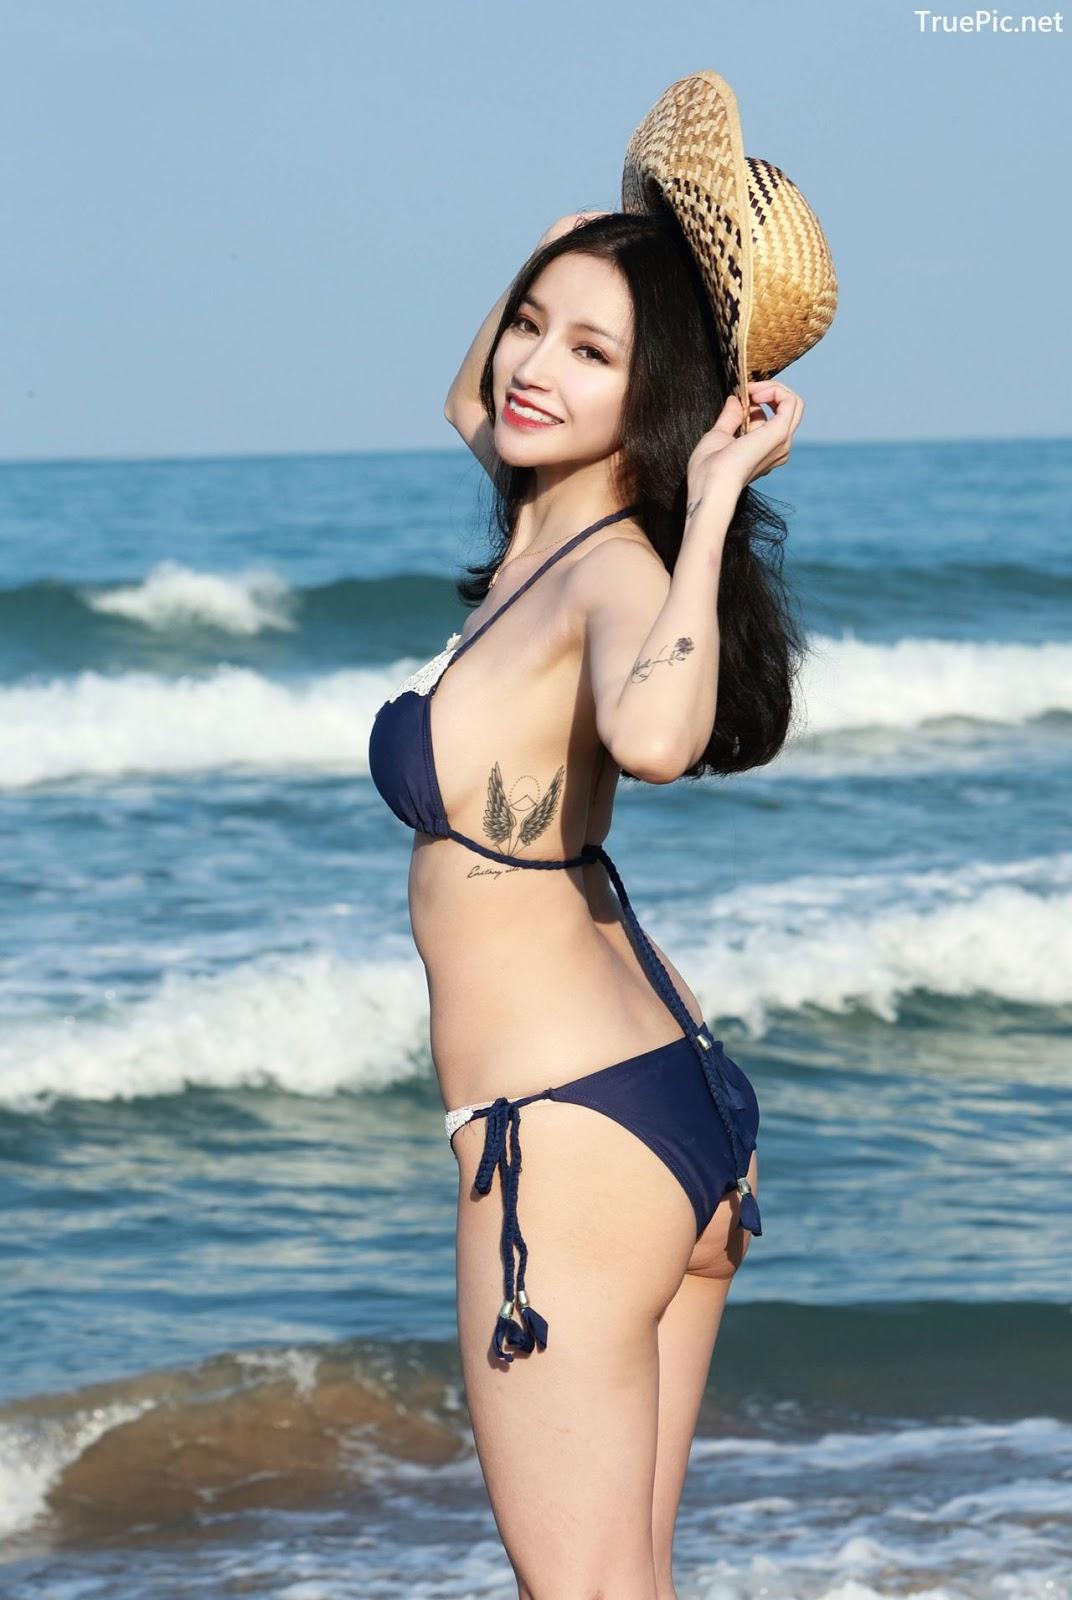 Image-Taiwanese-Model-艾薉-Beautiful-And-Sexy-Bikini-Girl-TruePic.net- Picture-8